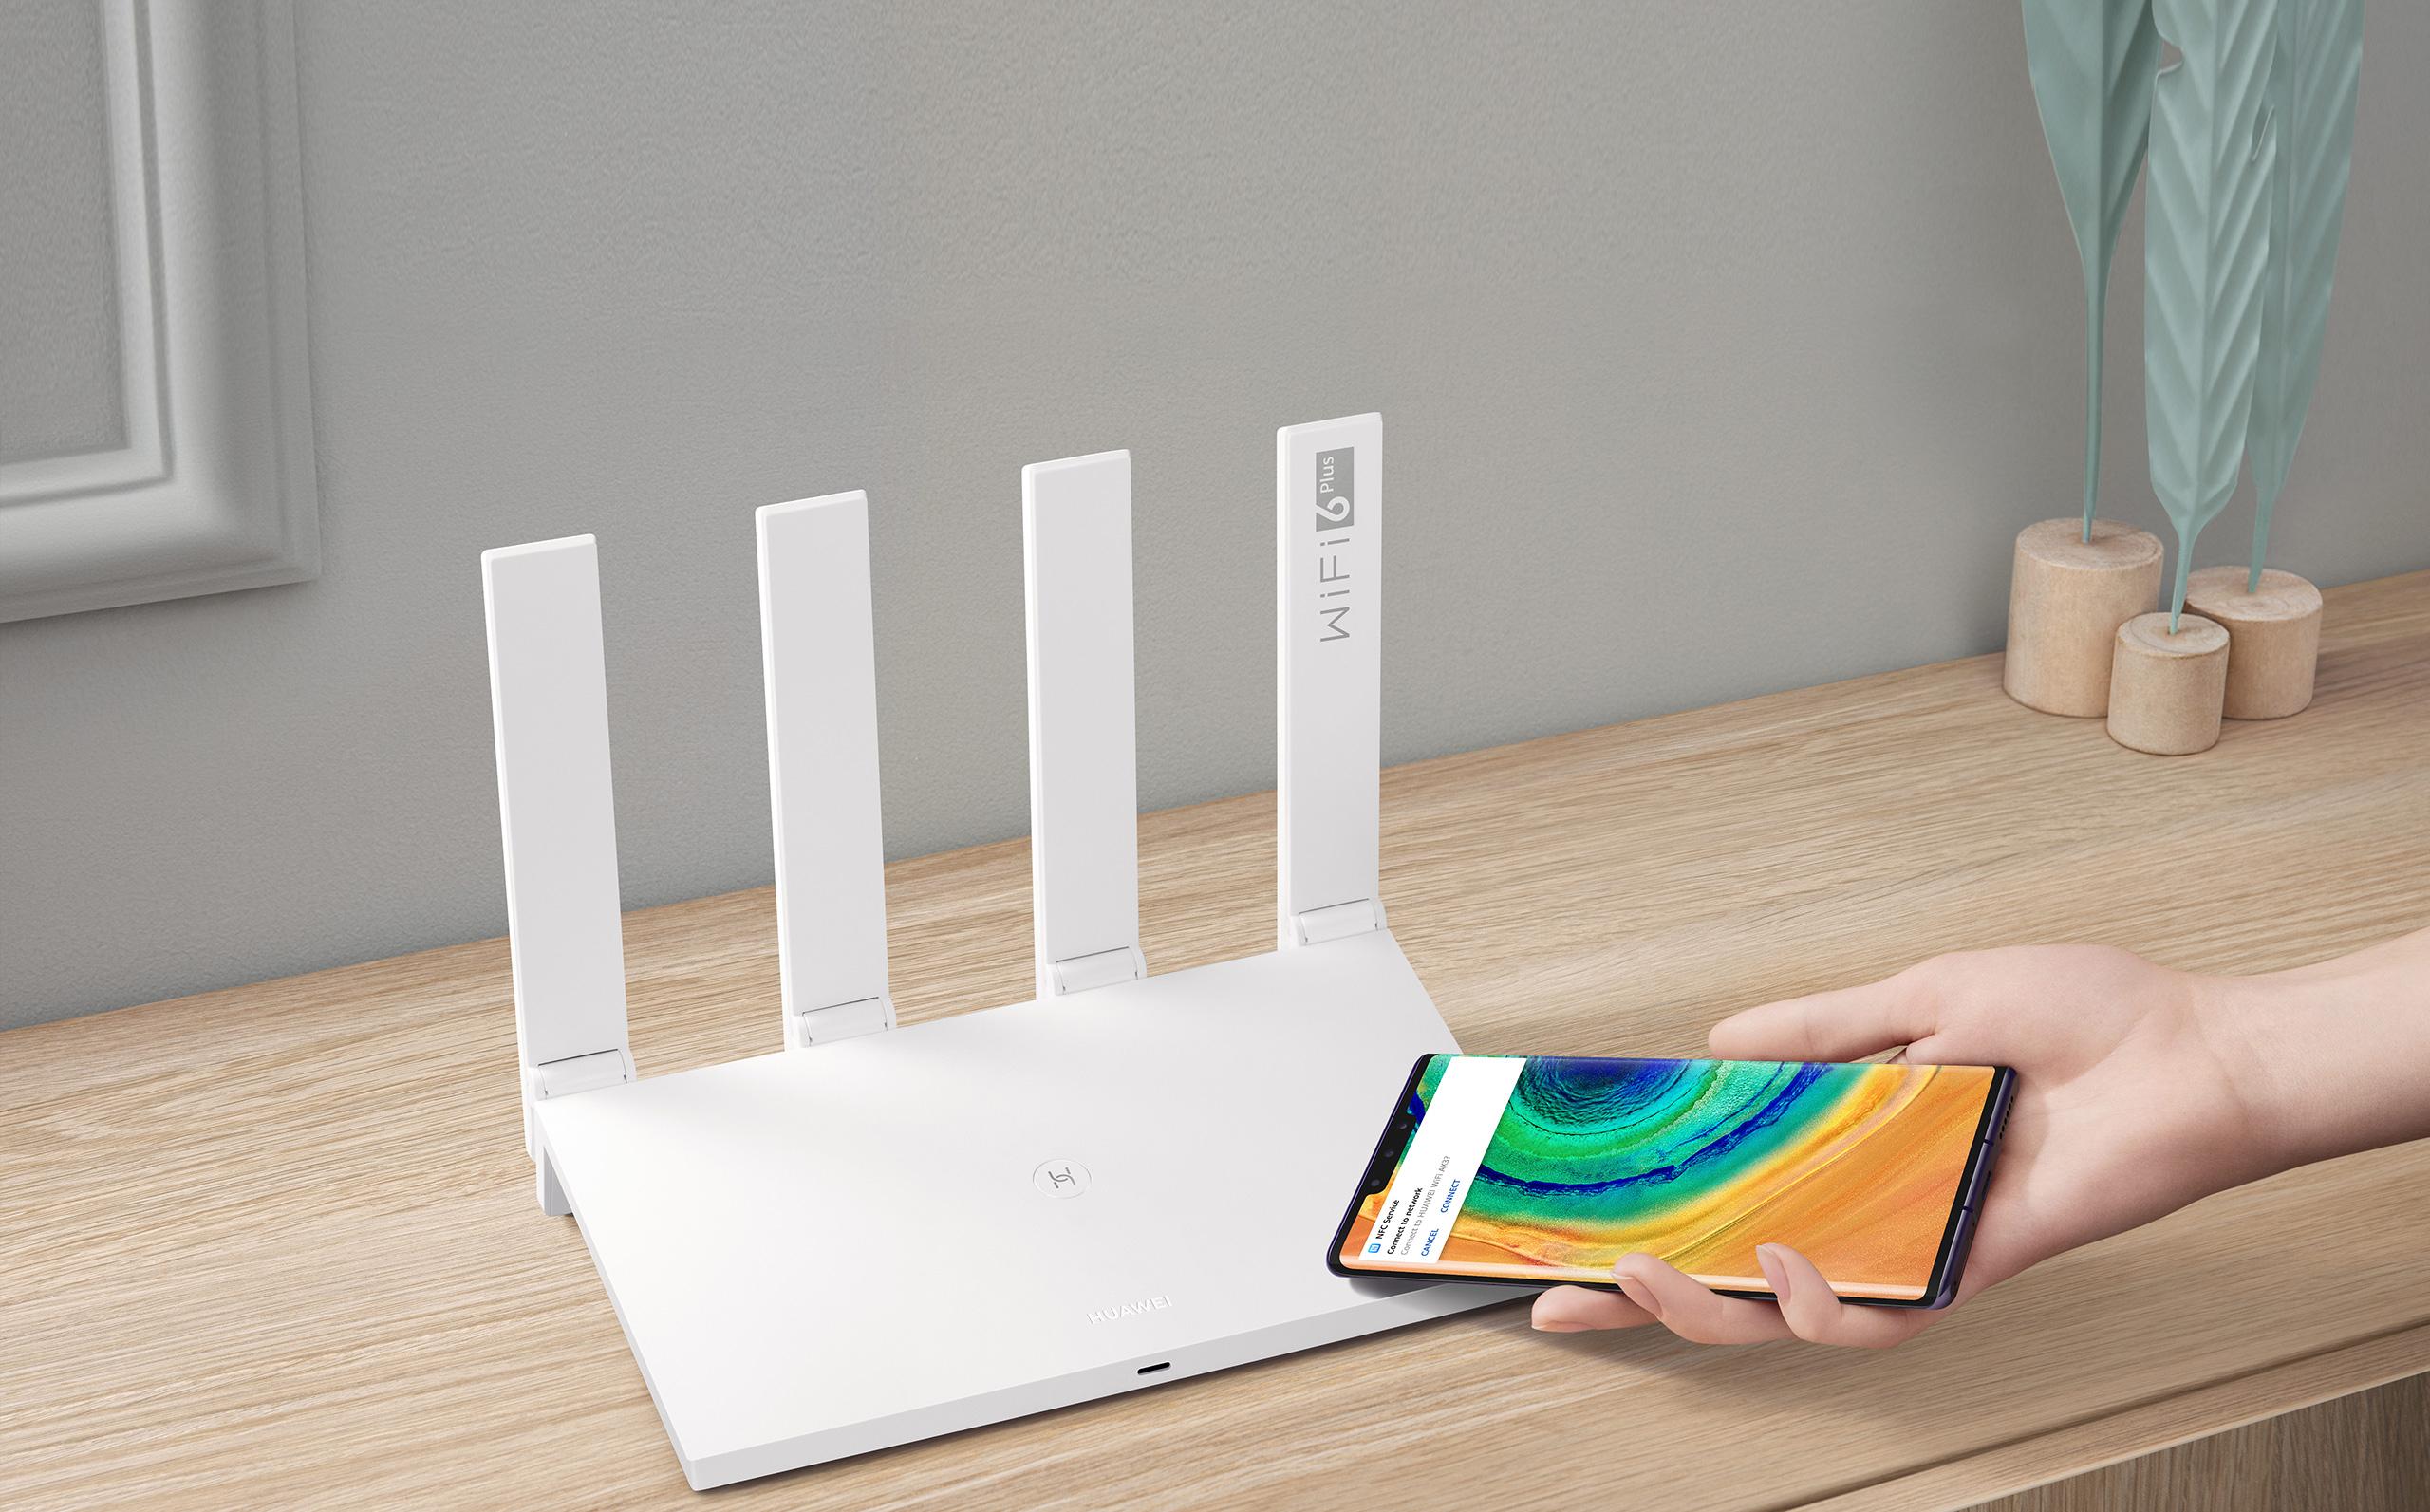 HUAWEI AX3 Quad-core Wi-Fi 6 Plus Revolution 3 £40.49 with code @ Huawei